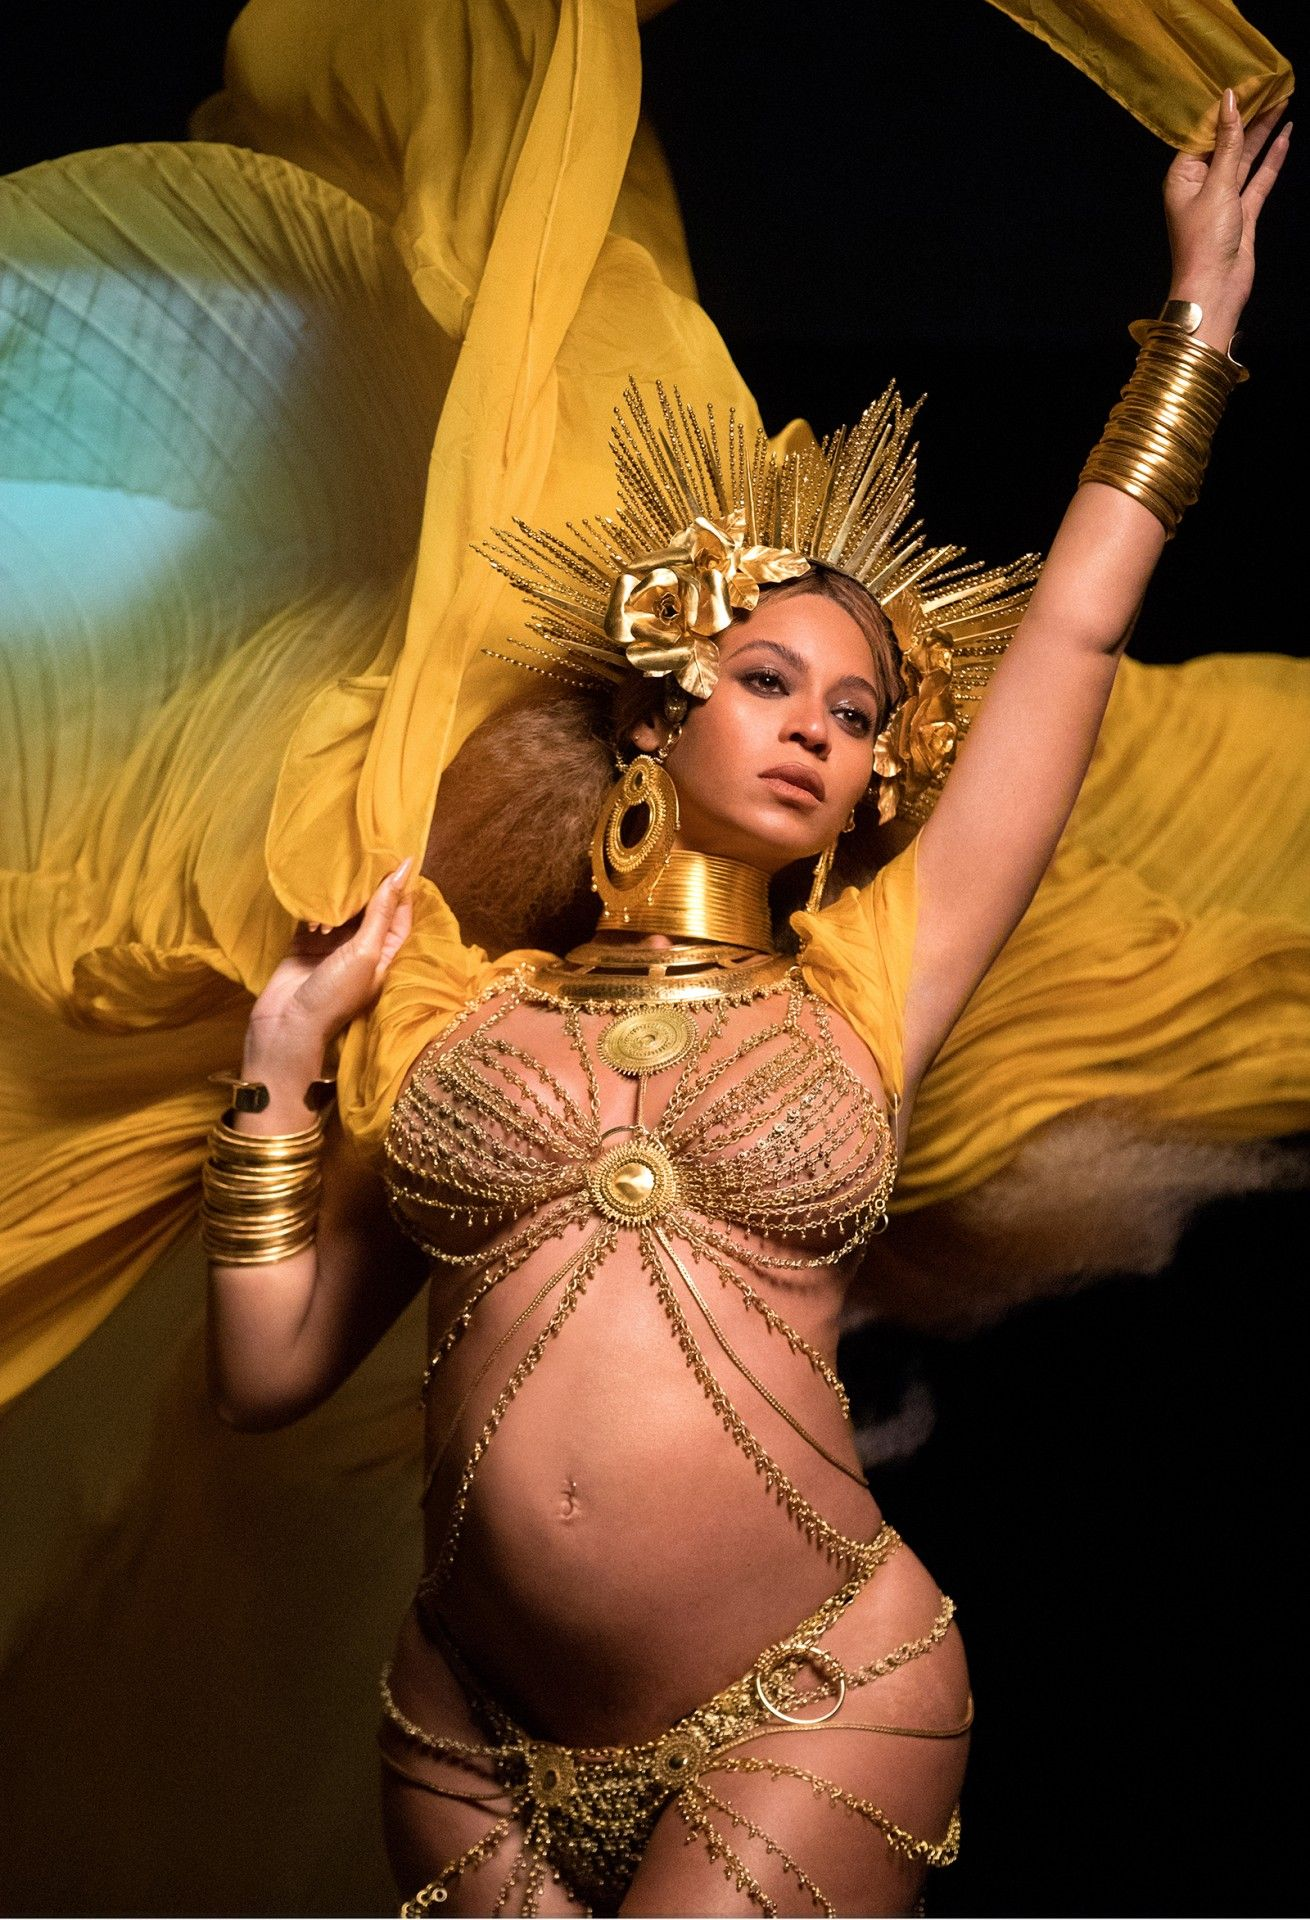 Beyonce Shares BTS Photos of 2017 Grammys Performance  Pregnant Beyonc Performs at Grammy Awards